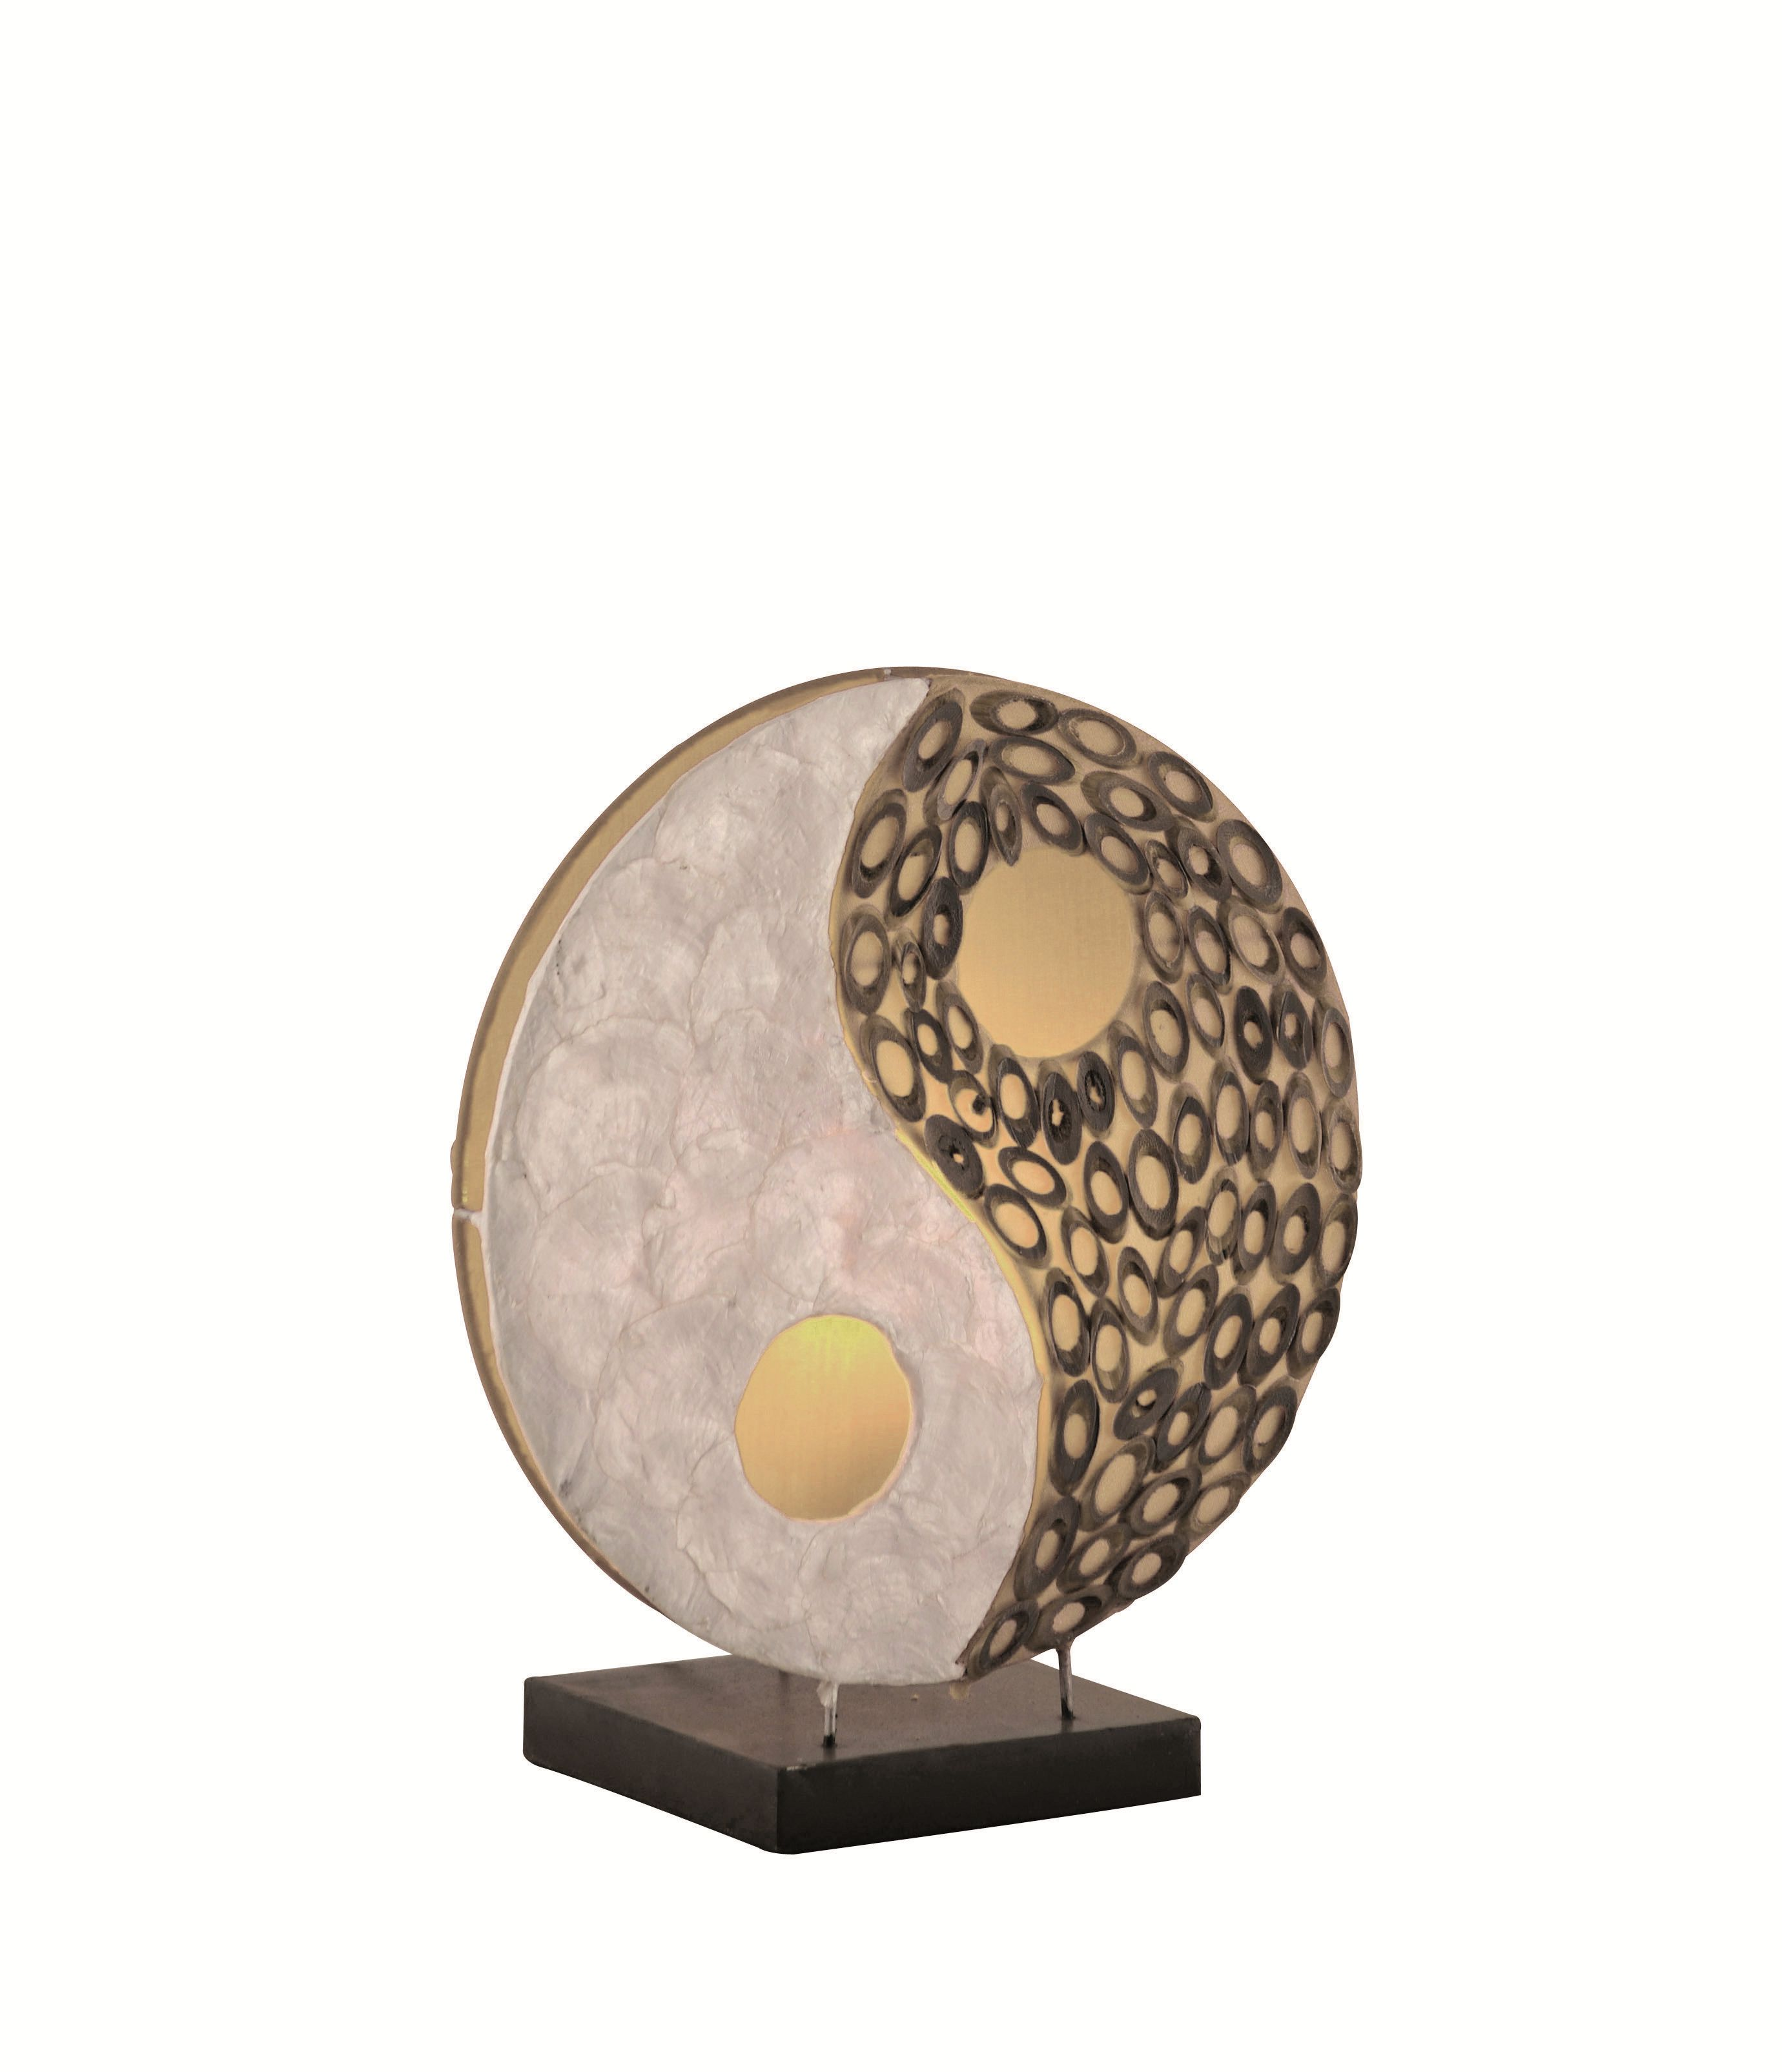 Tischleuchte Abuja ● Ying / Yang ● Perlmutt und Bambus- Paul Neuhaus A++